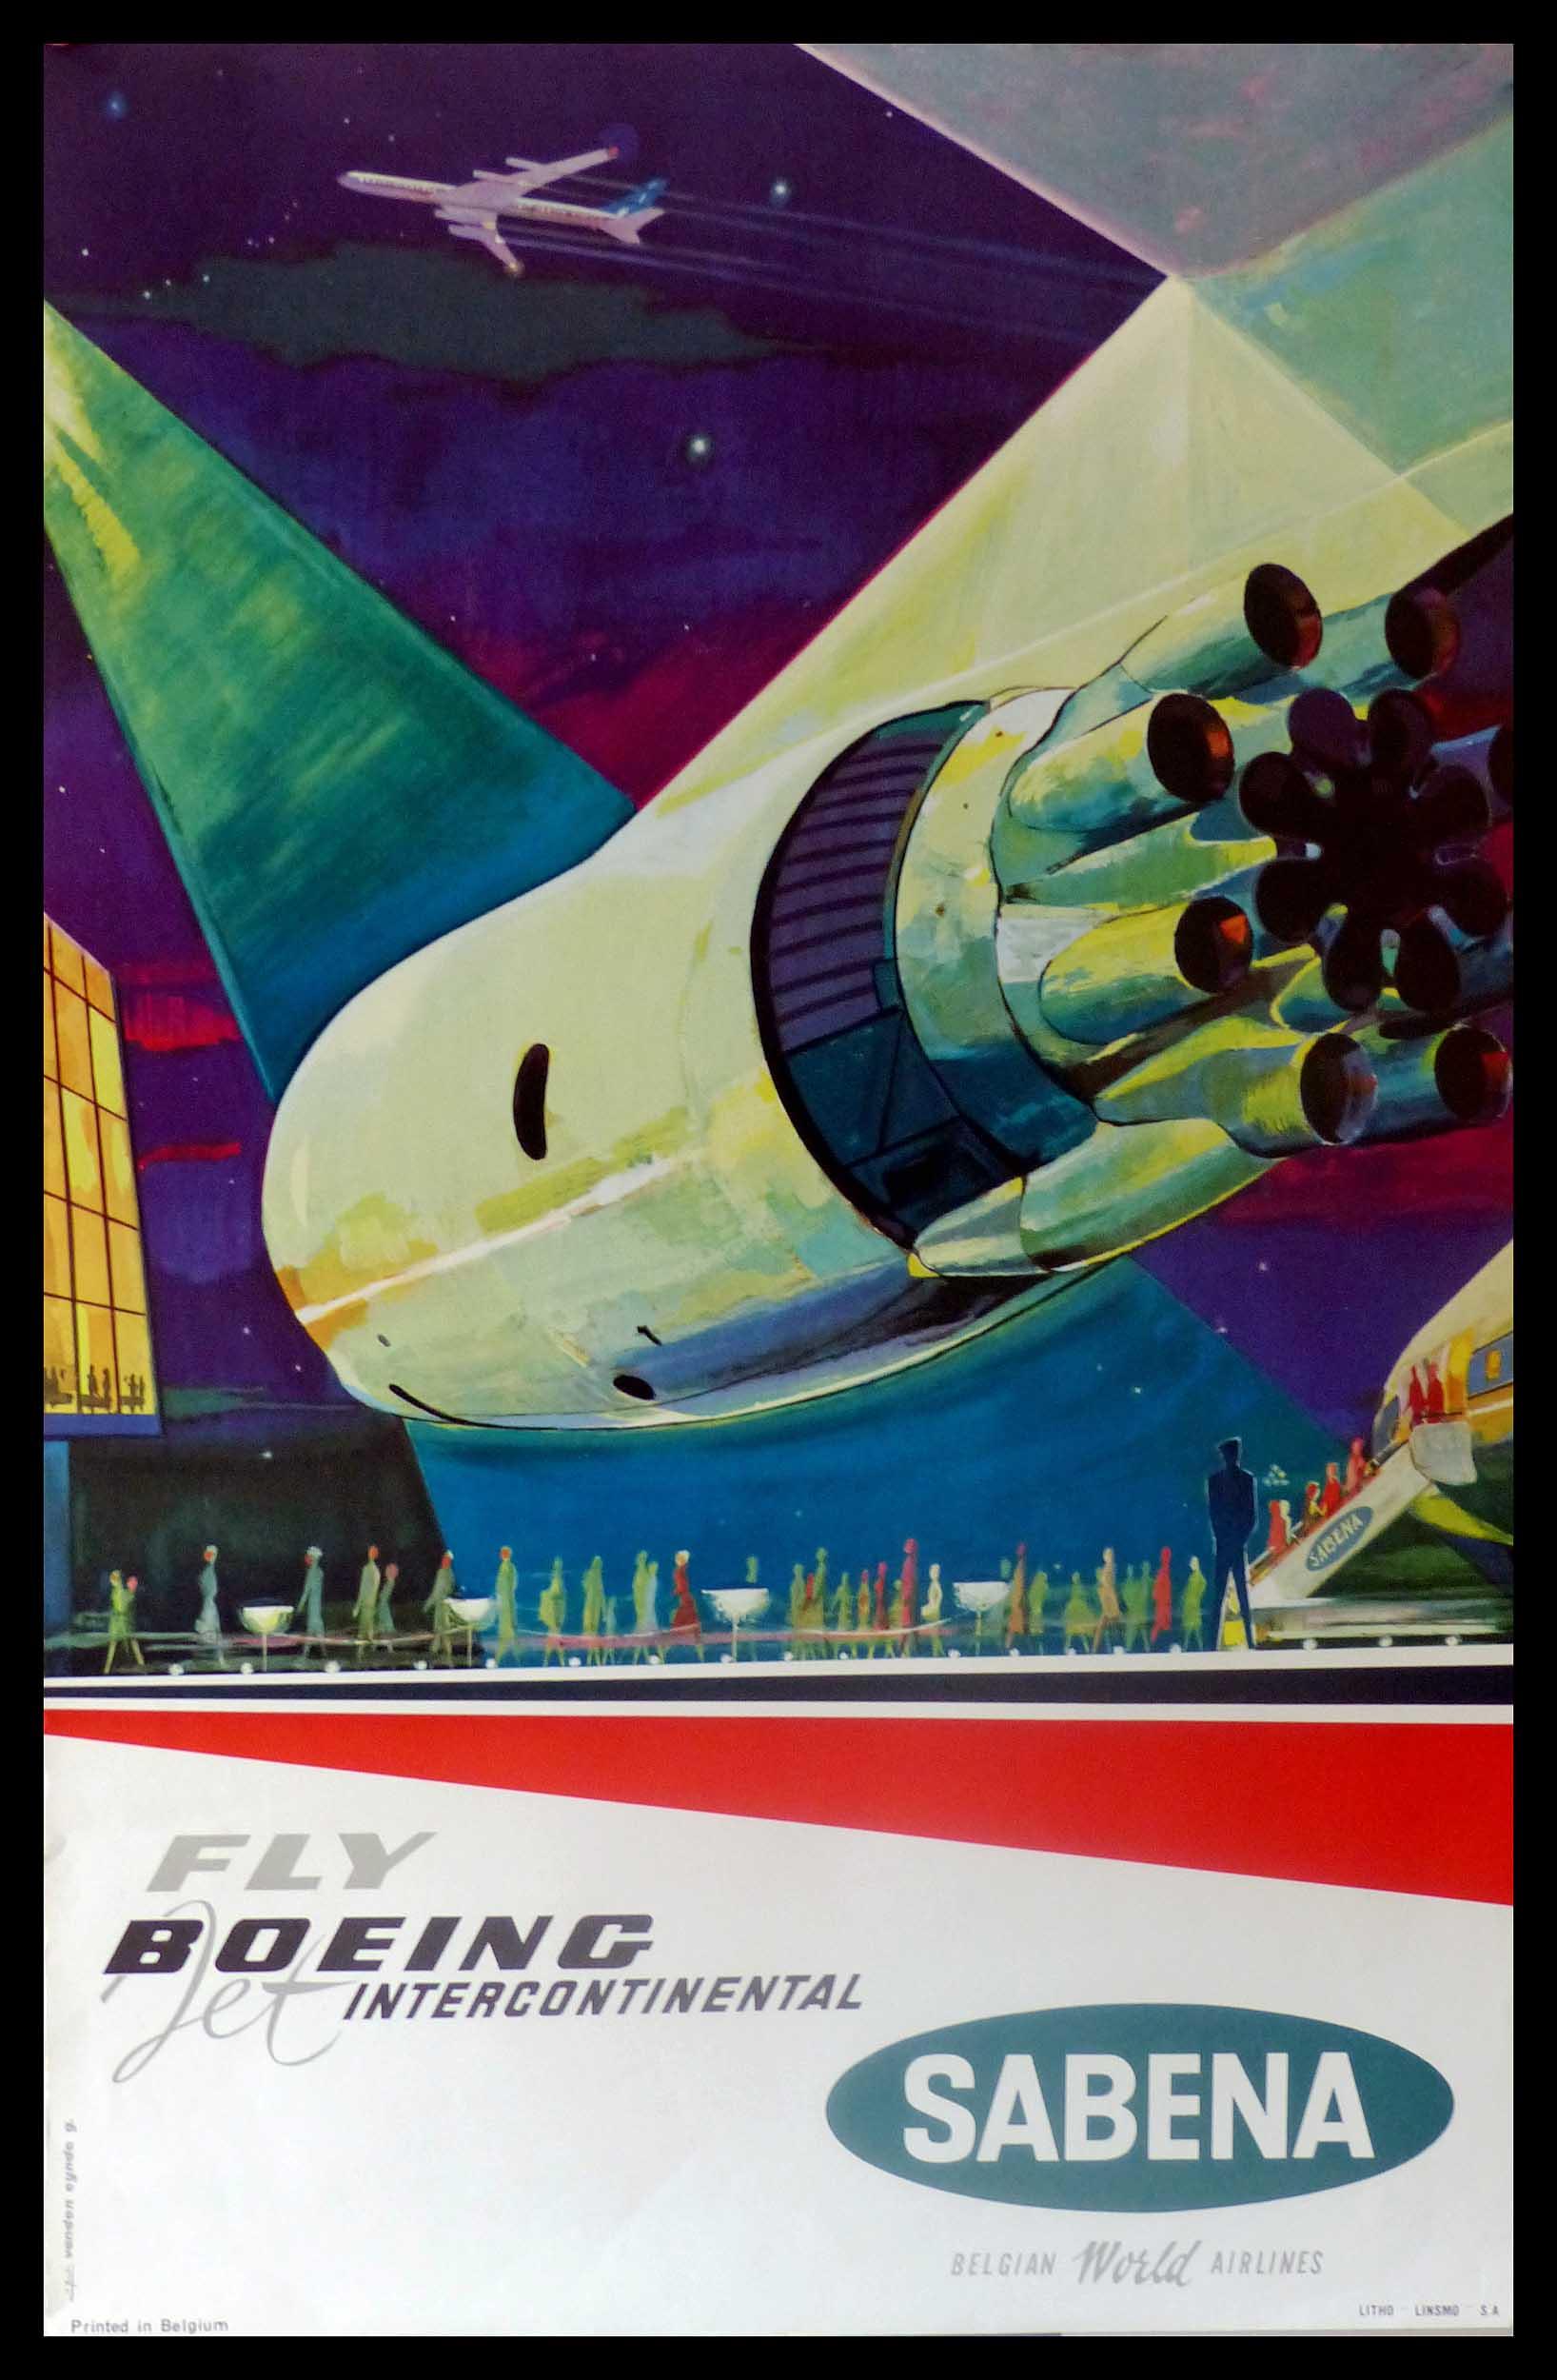 "(alt=""original transportation poster Fly Jet BOEING Intercontinental by SABENA Belgian air lines, Gaston VAN DEN EYNDE circa 1950"")"